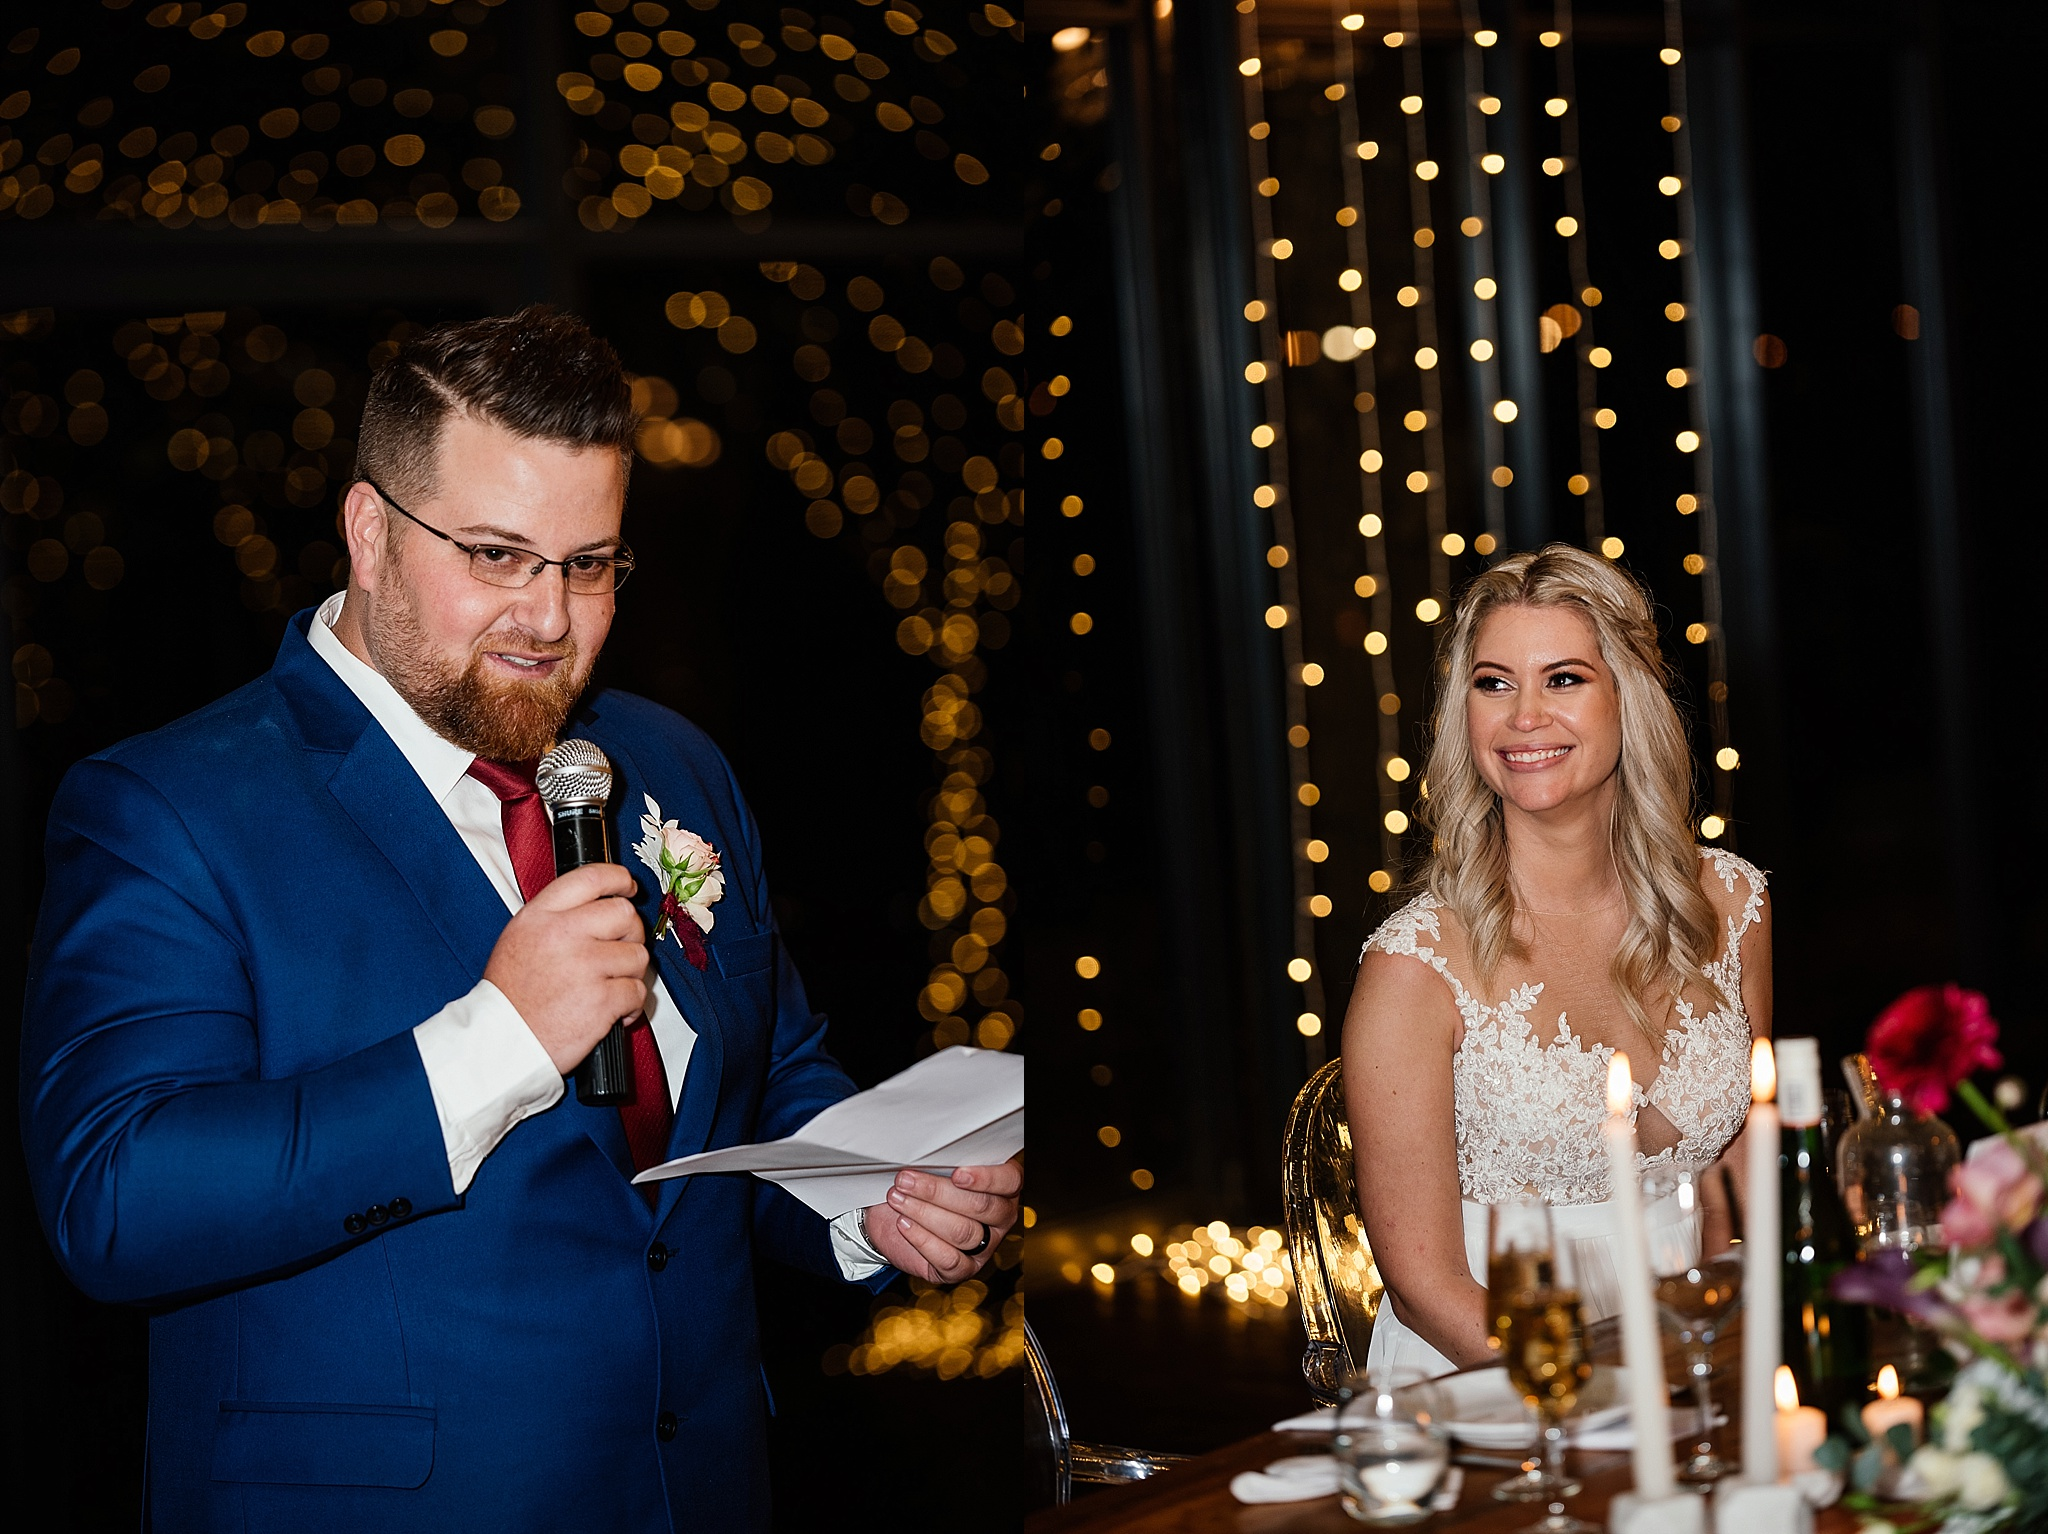 Cape Town Photographer Darren Bester - Die Woud Wedding - Gareth & Roxanne_0051.jpg